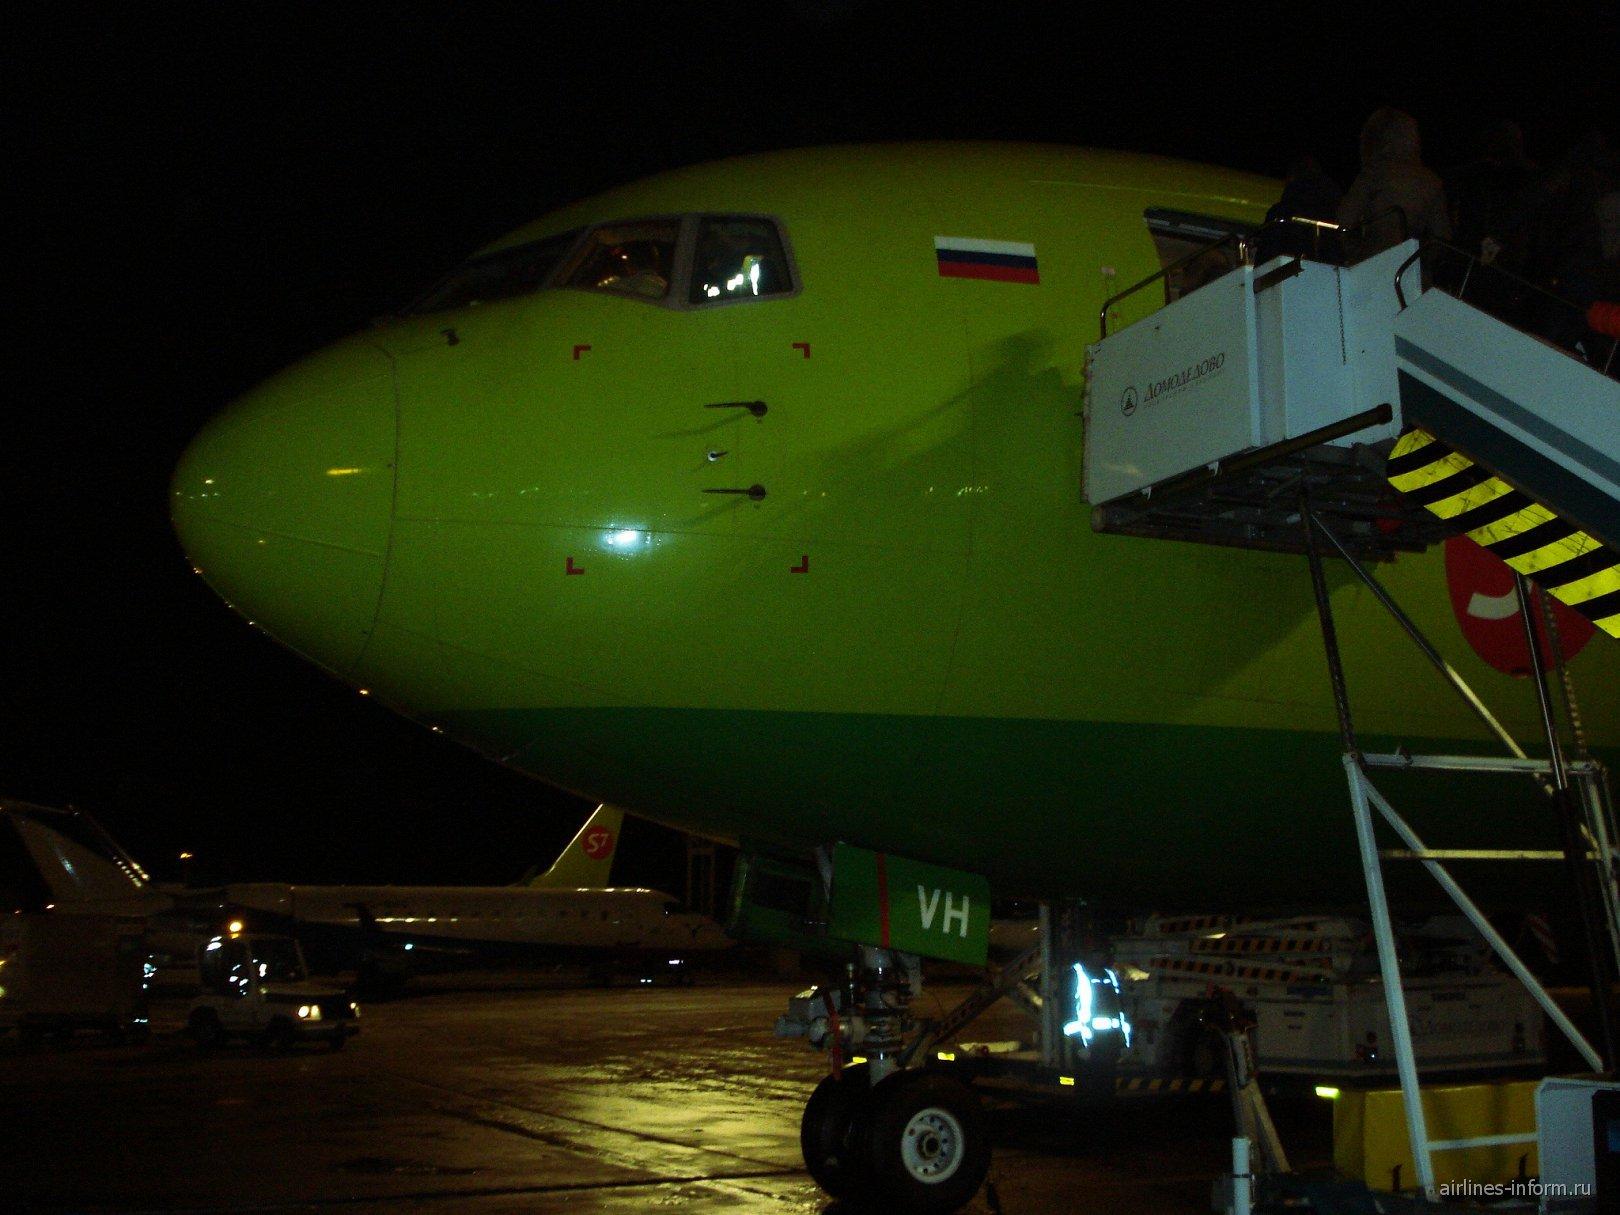 """S7 airlines"" Санкт-Петербург-Москва-Новосибирск"